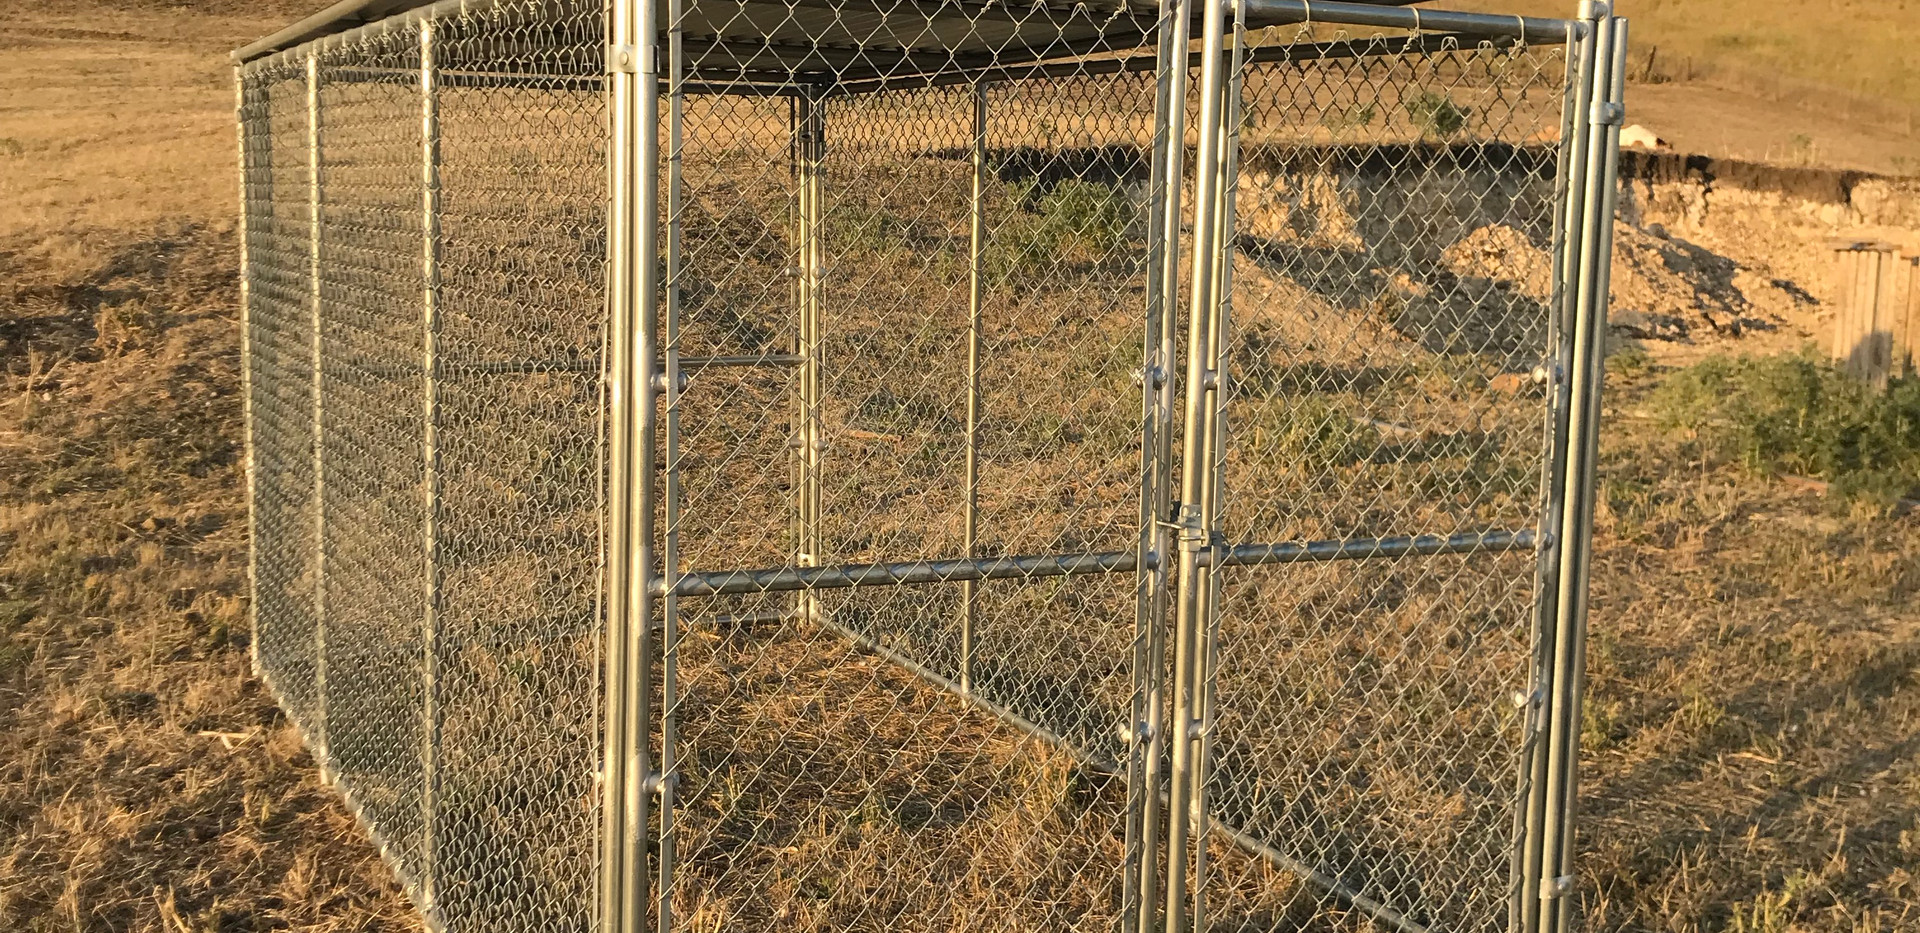 Standard Dog Kennel Photo 1.jpg